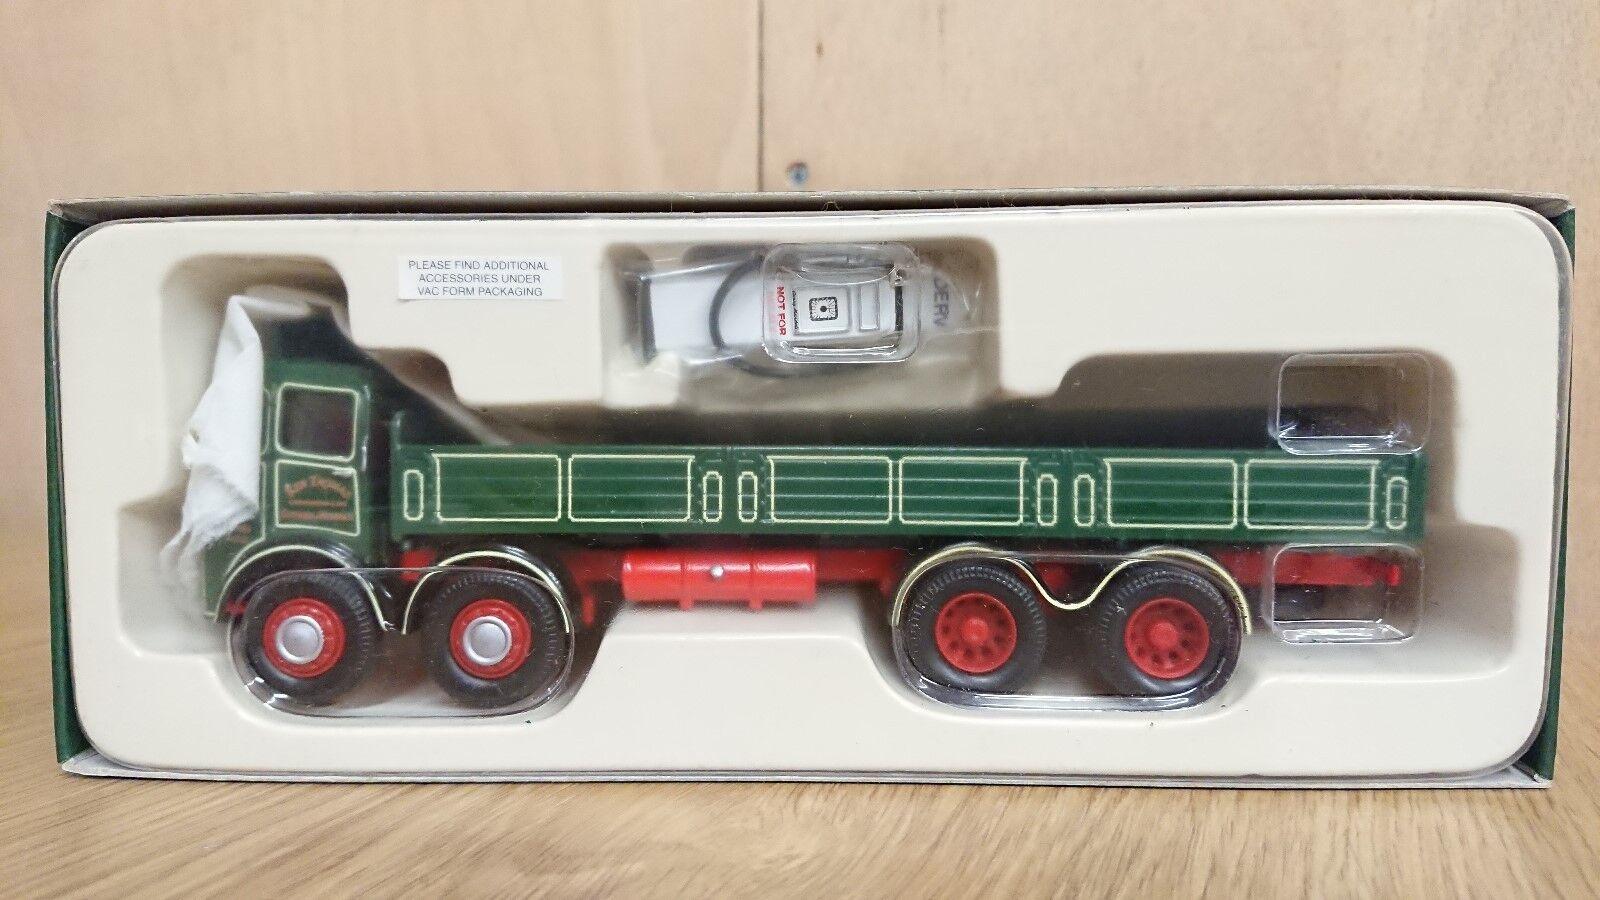 Corgi 10103 ERF V 8 Wheel Dropside Lorry KEN THOMAS Ltd Ed No. 0002 of 2000